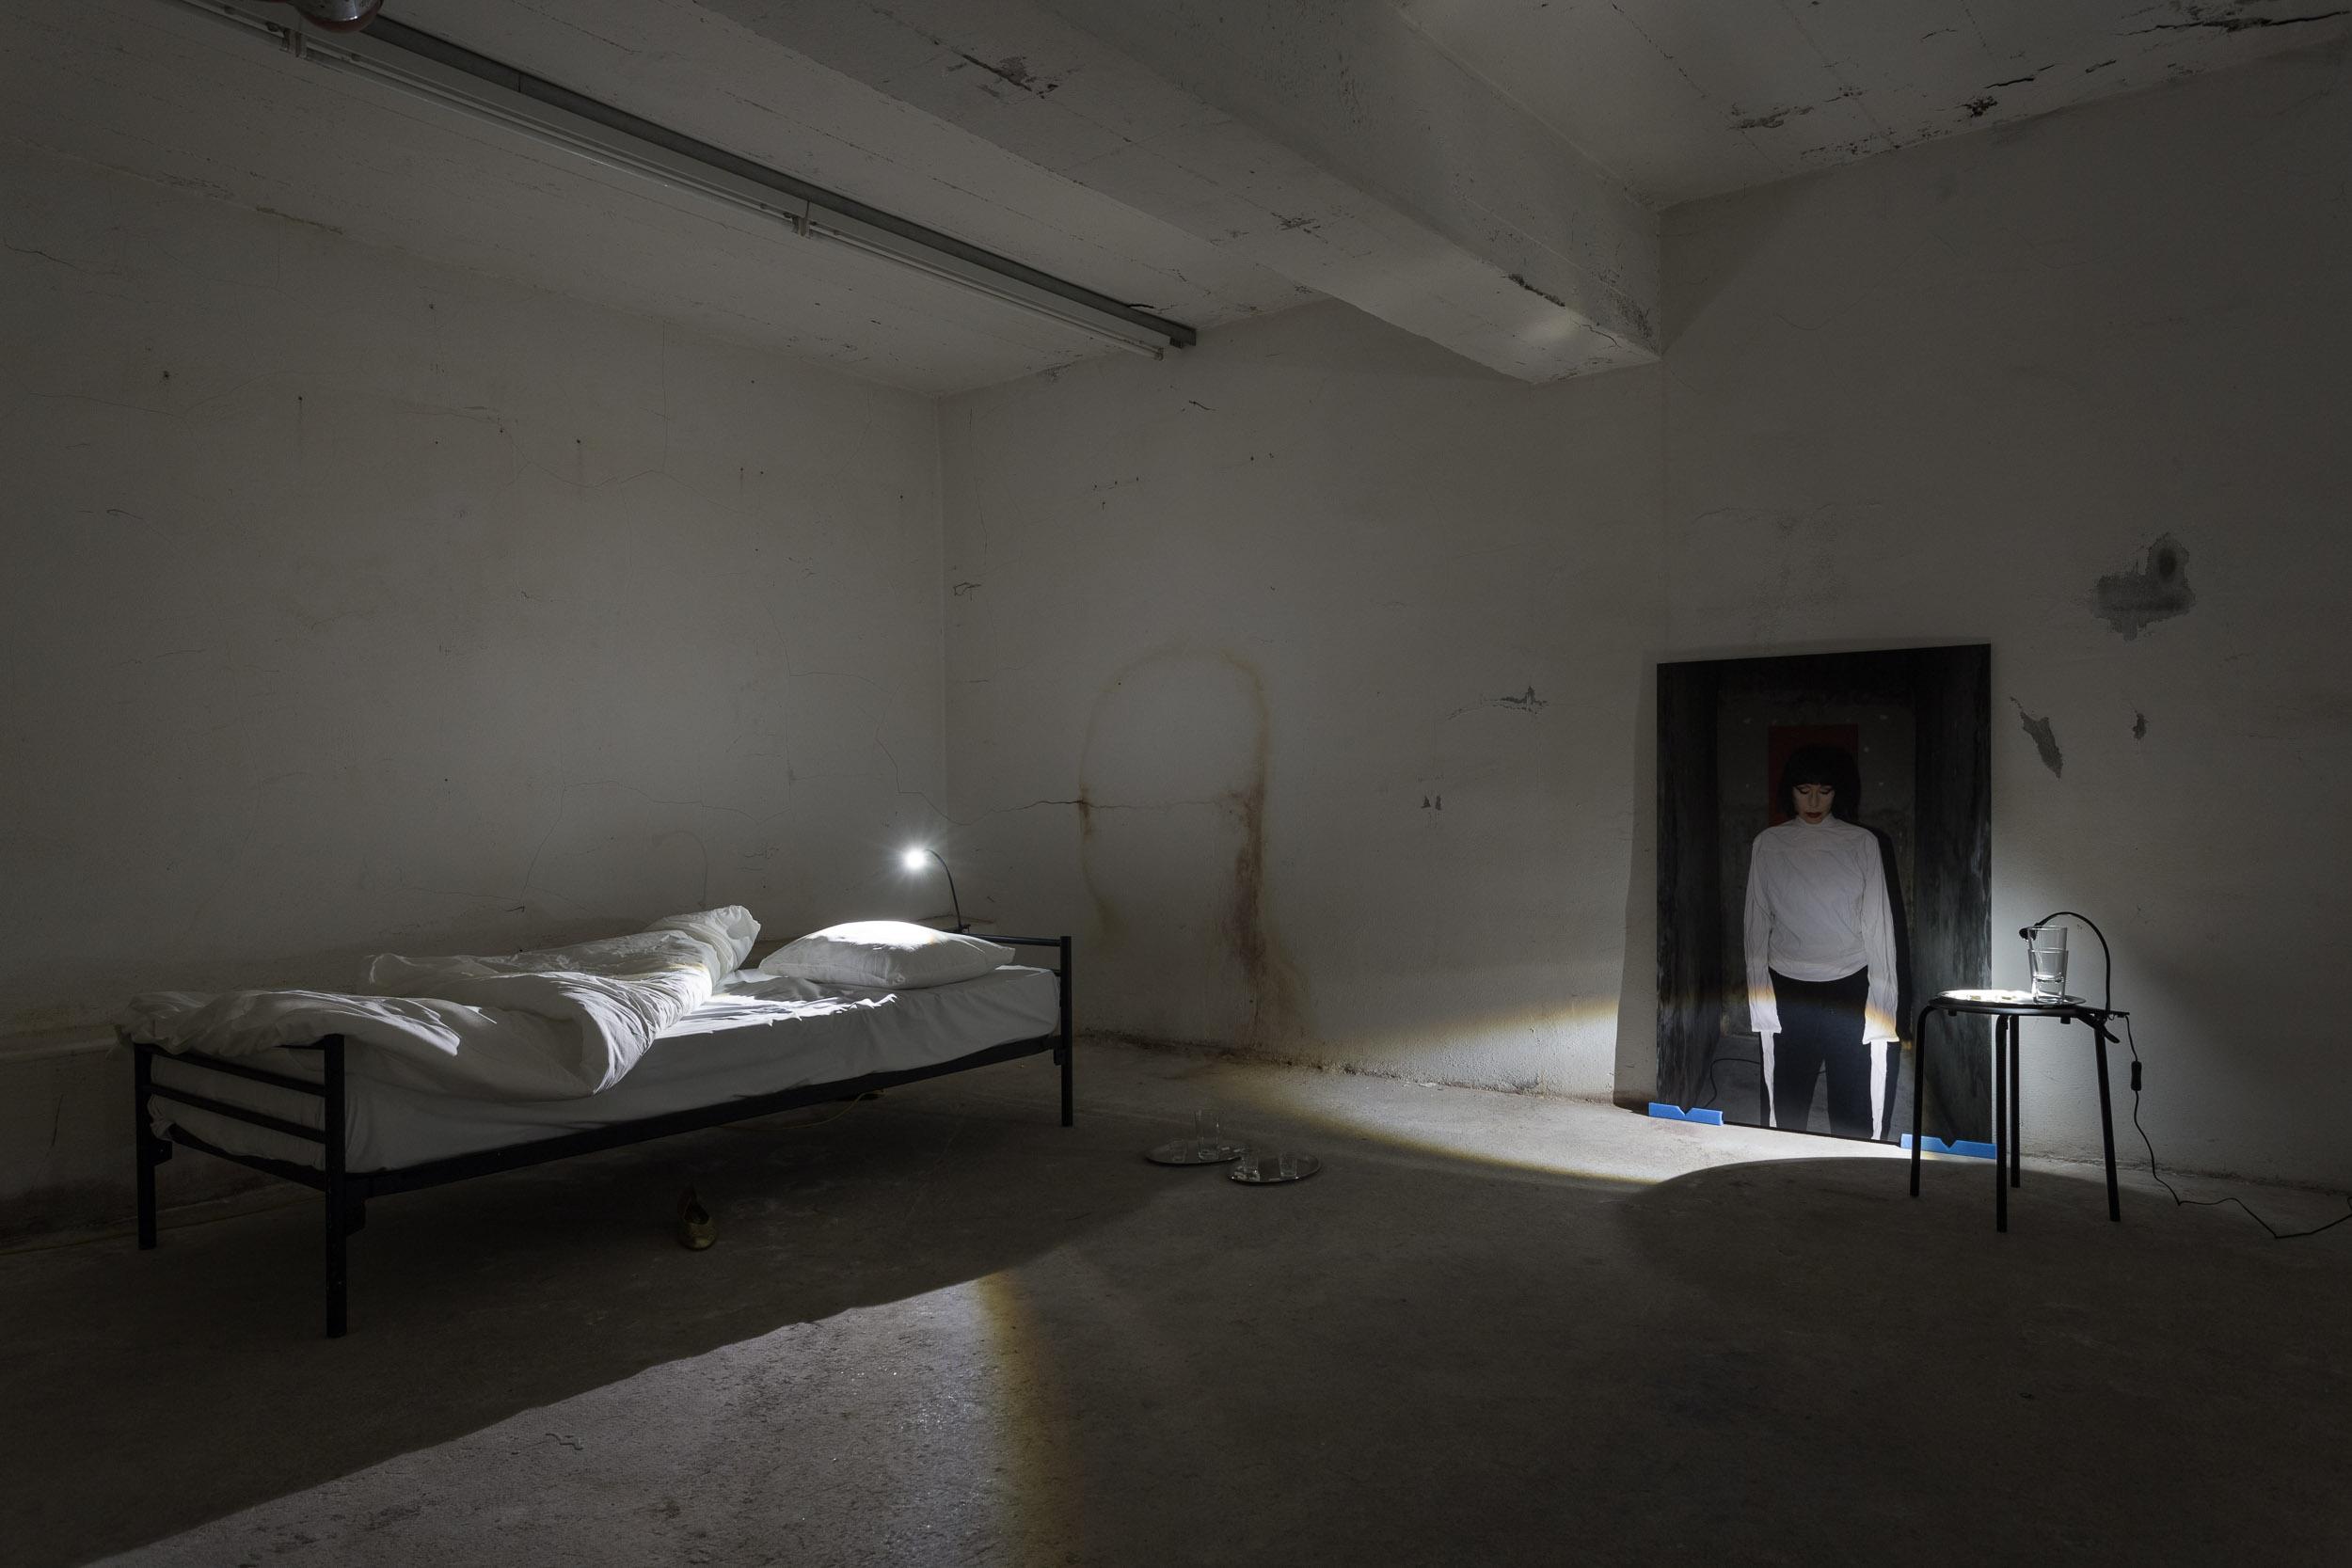 Manon,  Der Wachsaal,  2018, Room Installation, Dimension Variable  Installation view  Photo: Kilian Bannwart